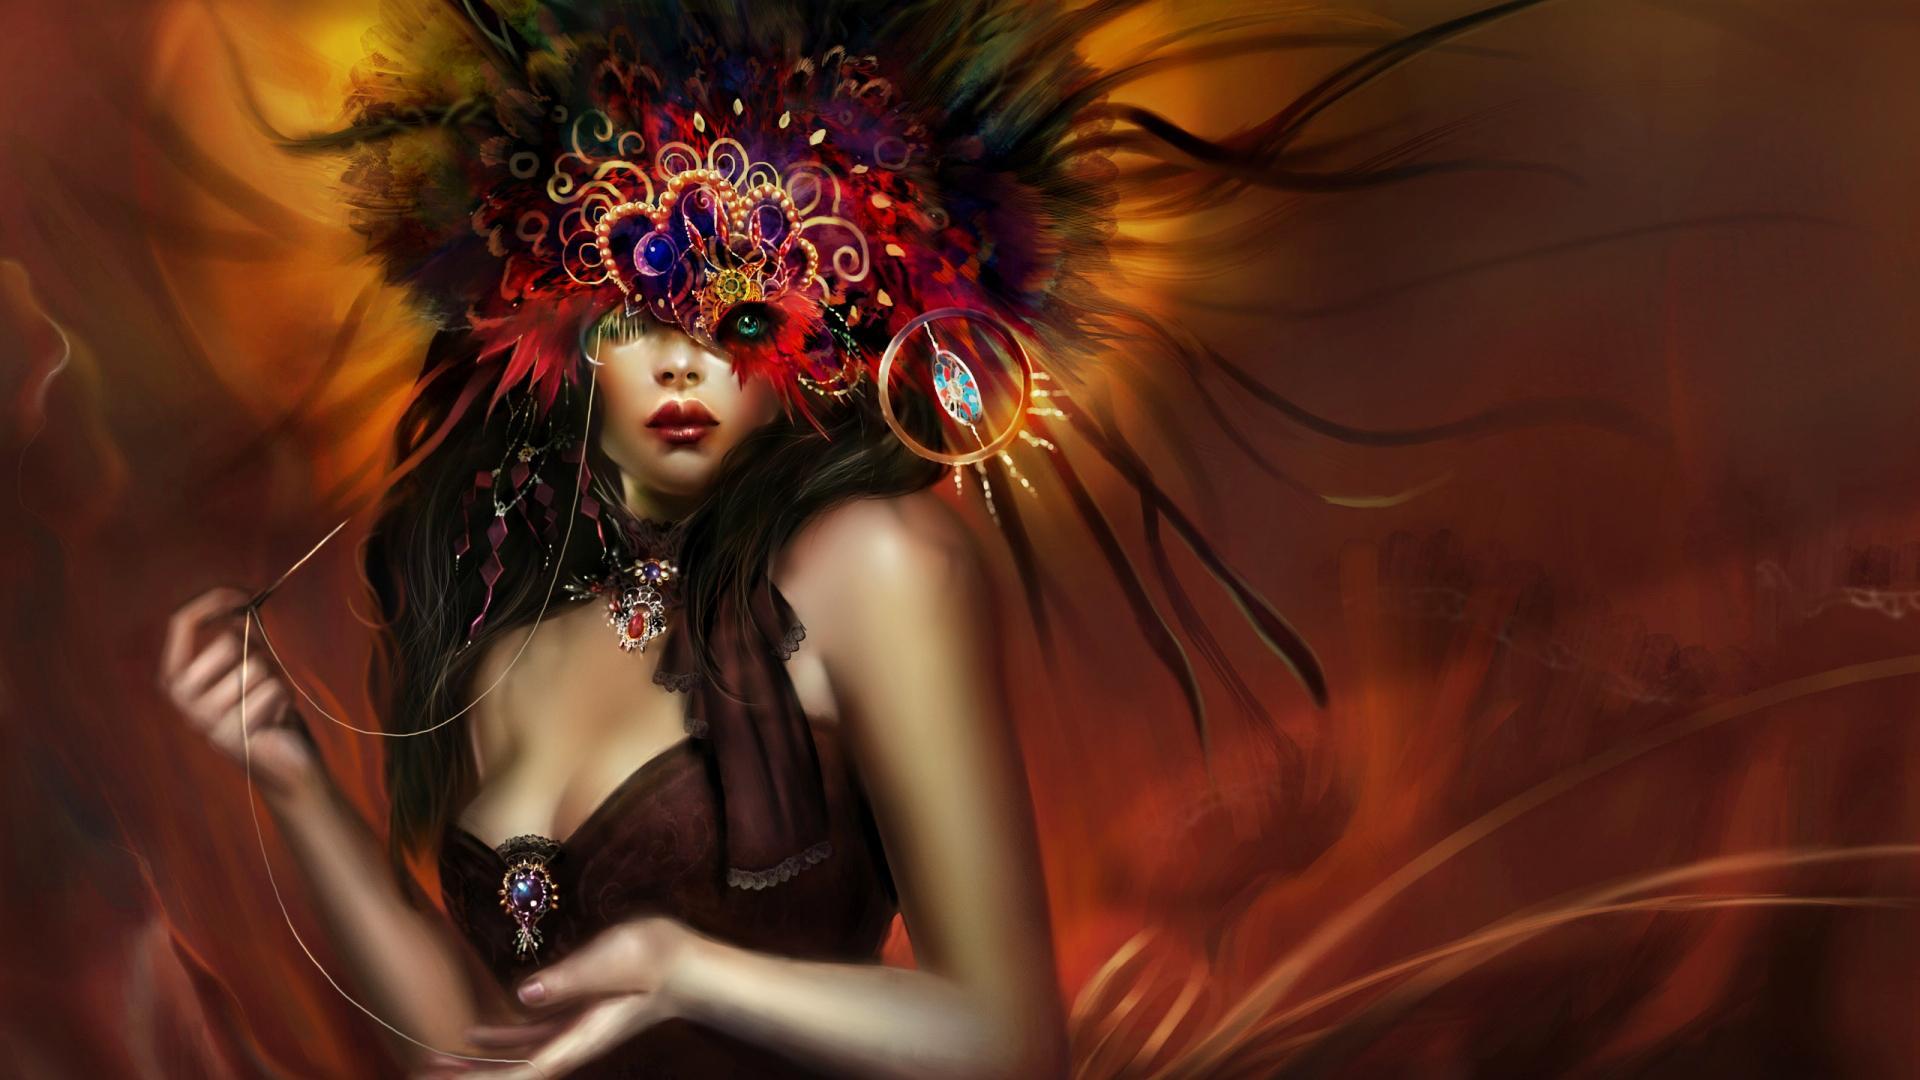 Fall Masquerade Fairies Wallpapers Fantasy Woman Masked Wallpapers 22 Wallpapers